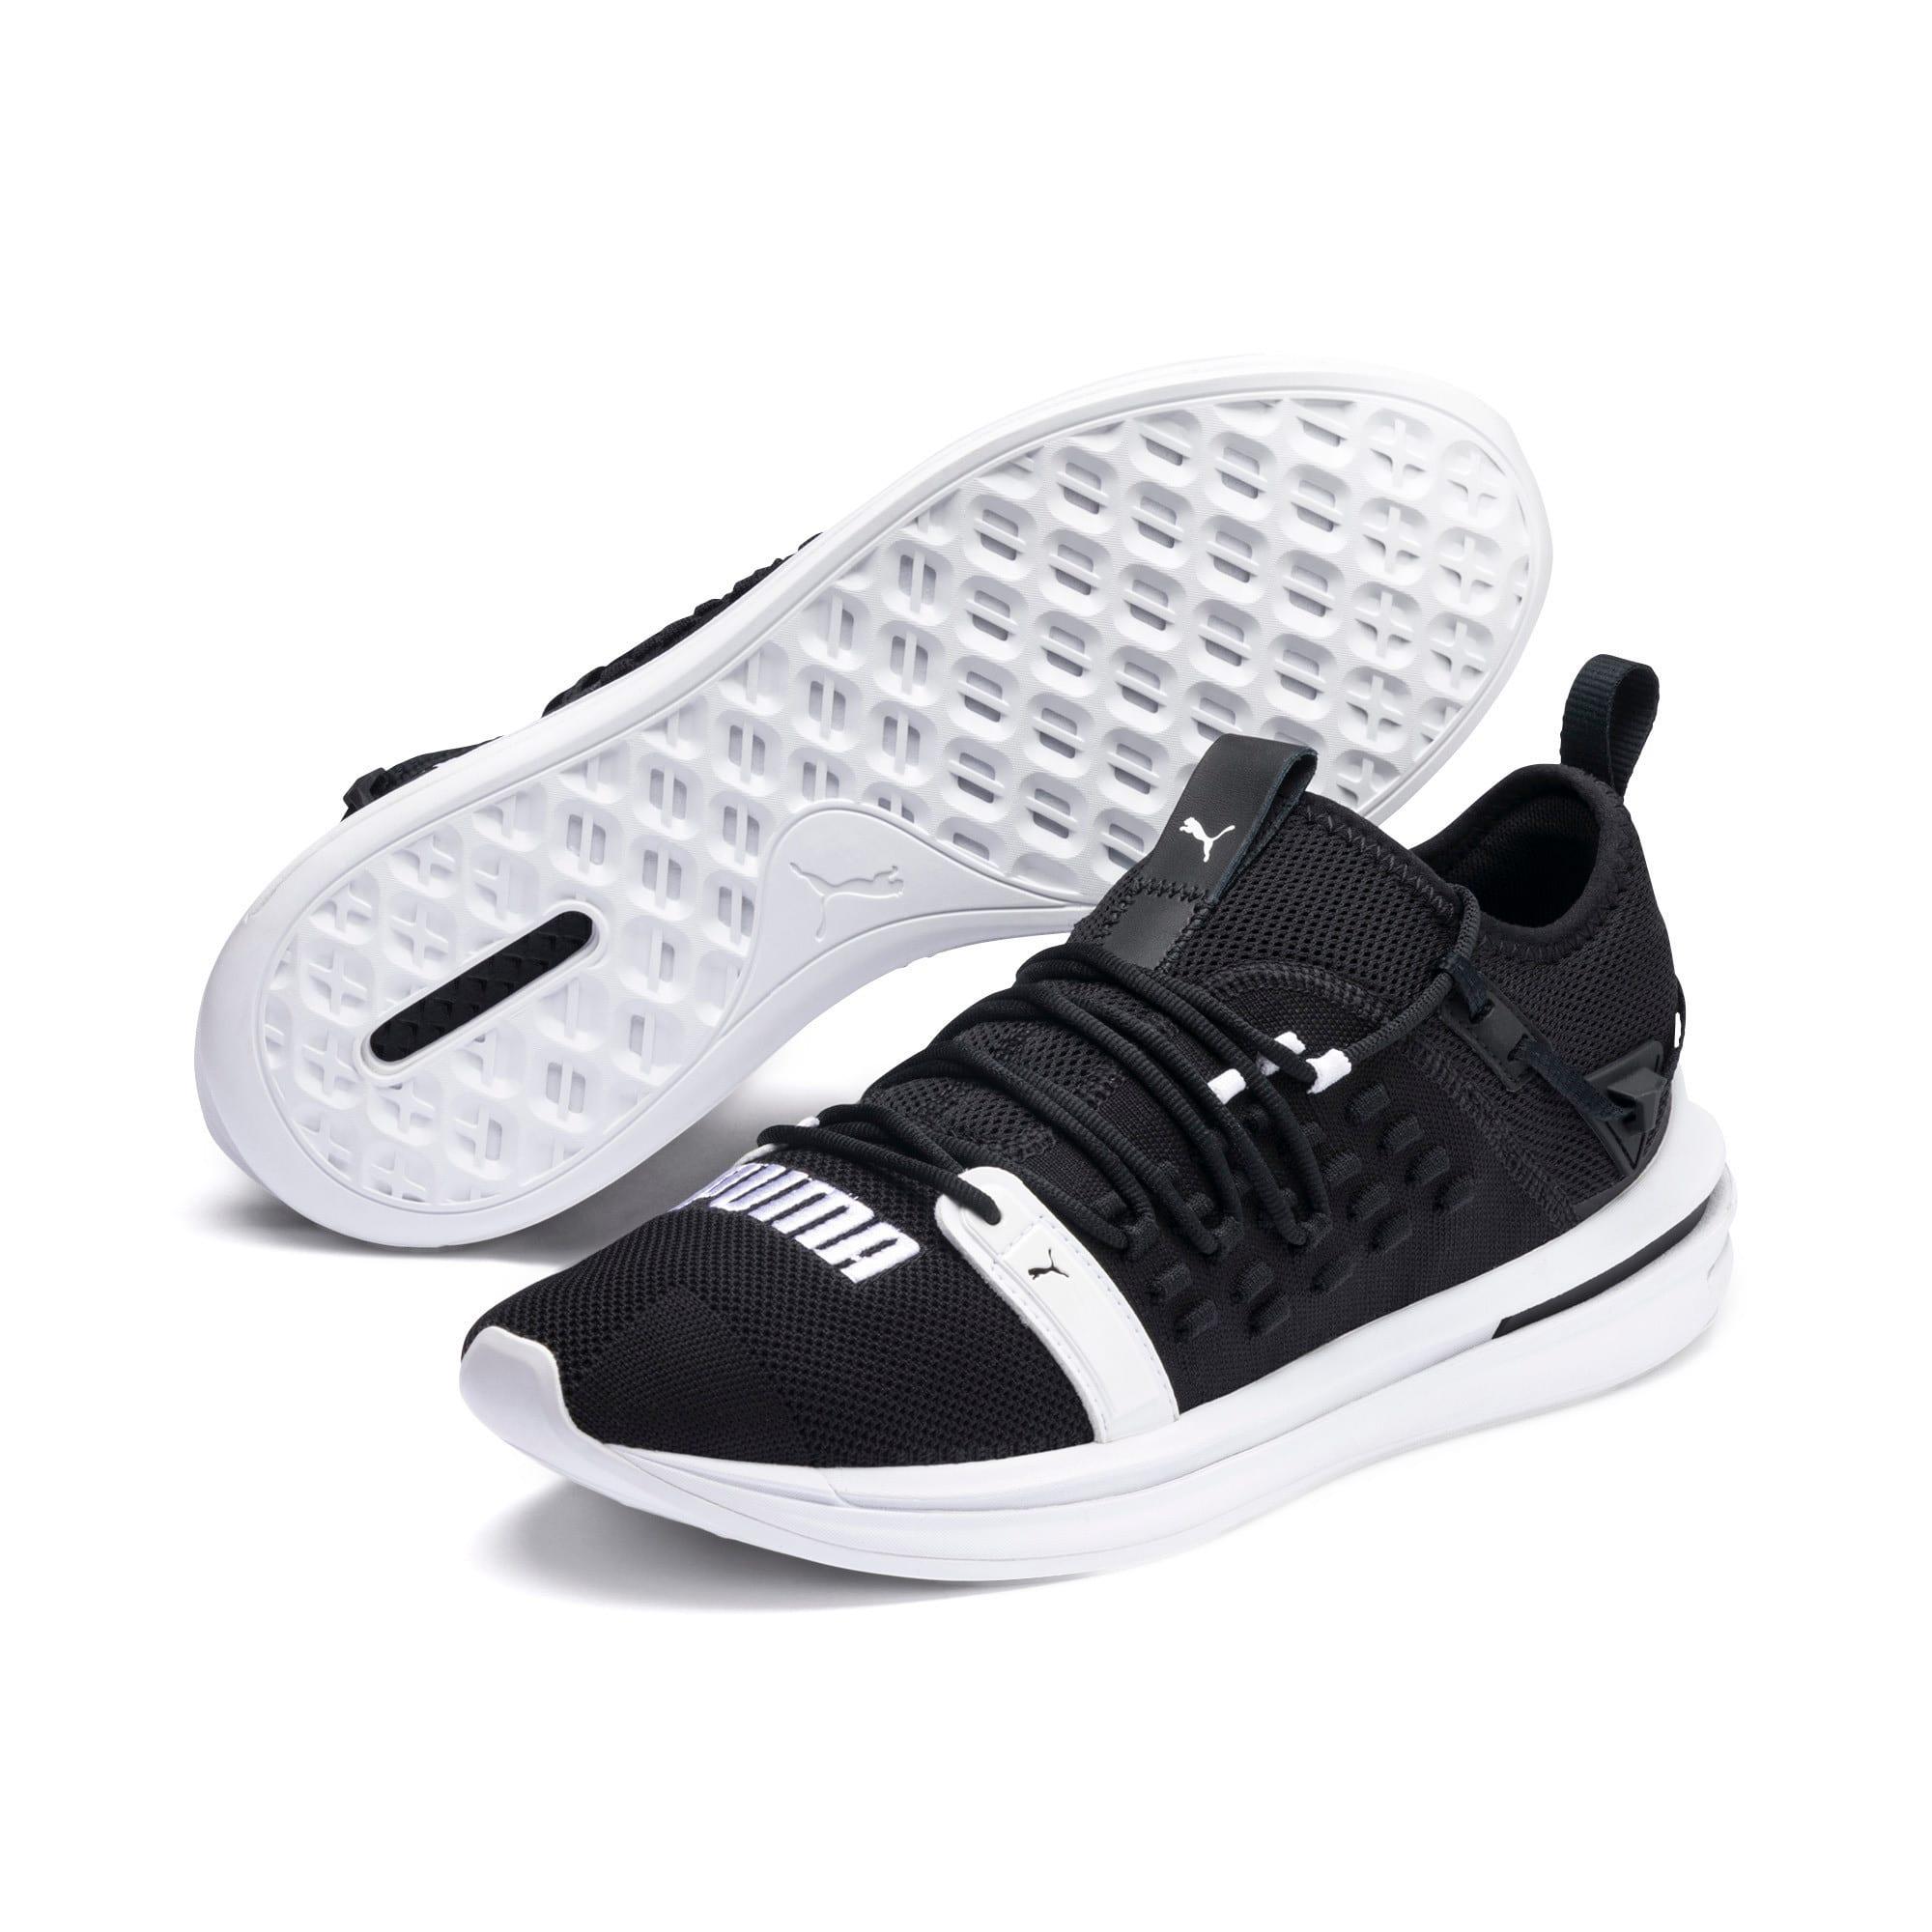 Thumbnail 4 of IGNITE Limitless SR FUSEFIT Running Shoes, Puma Black-Puma White, medium-IND